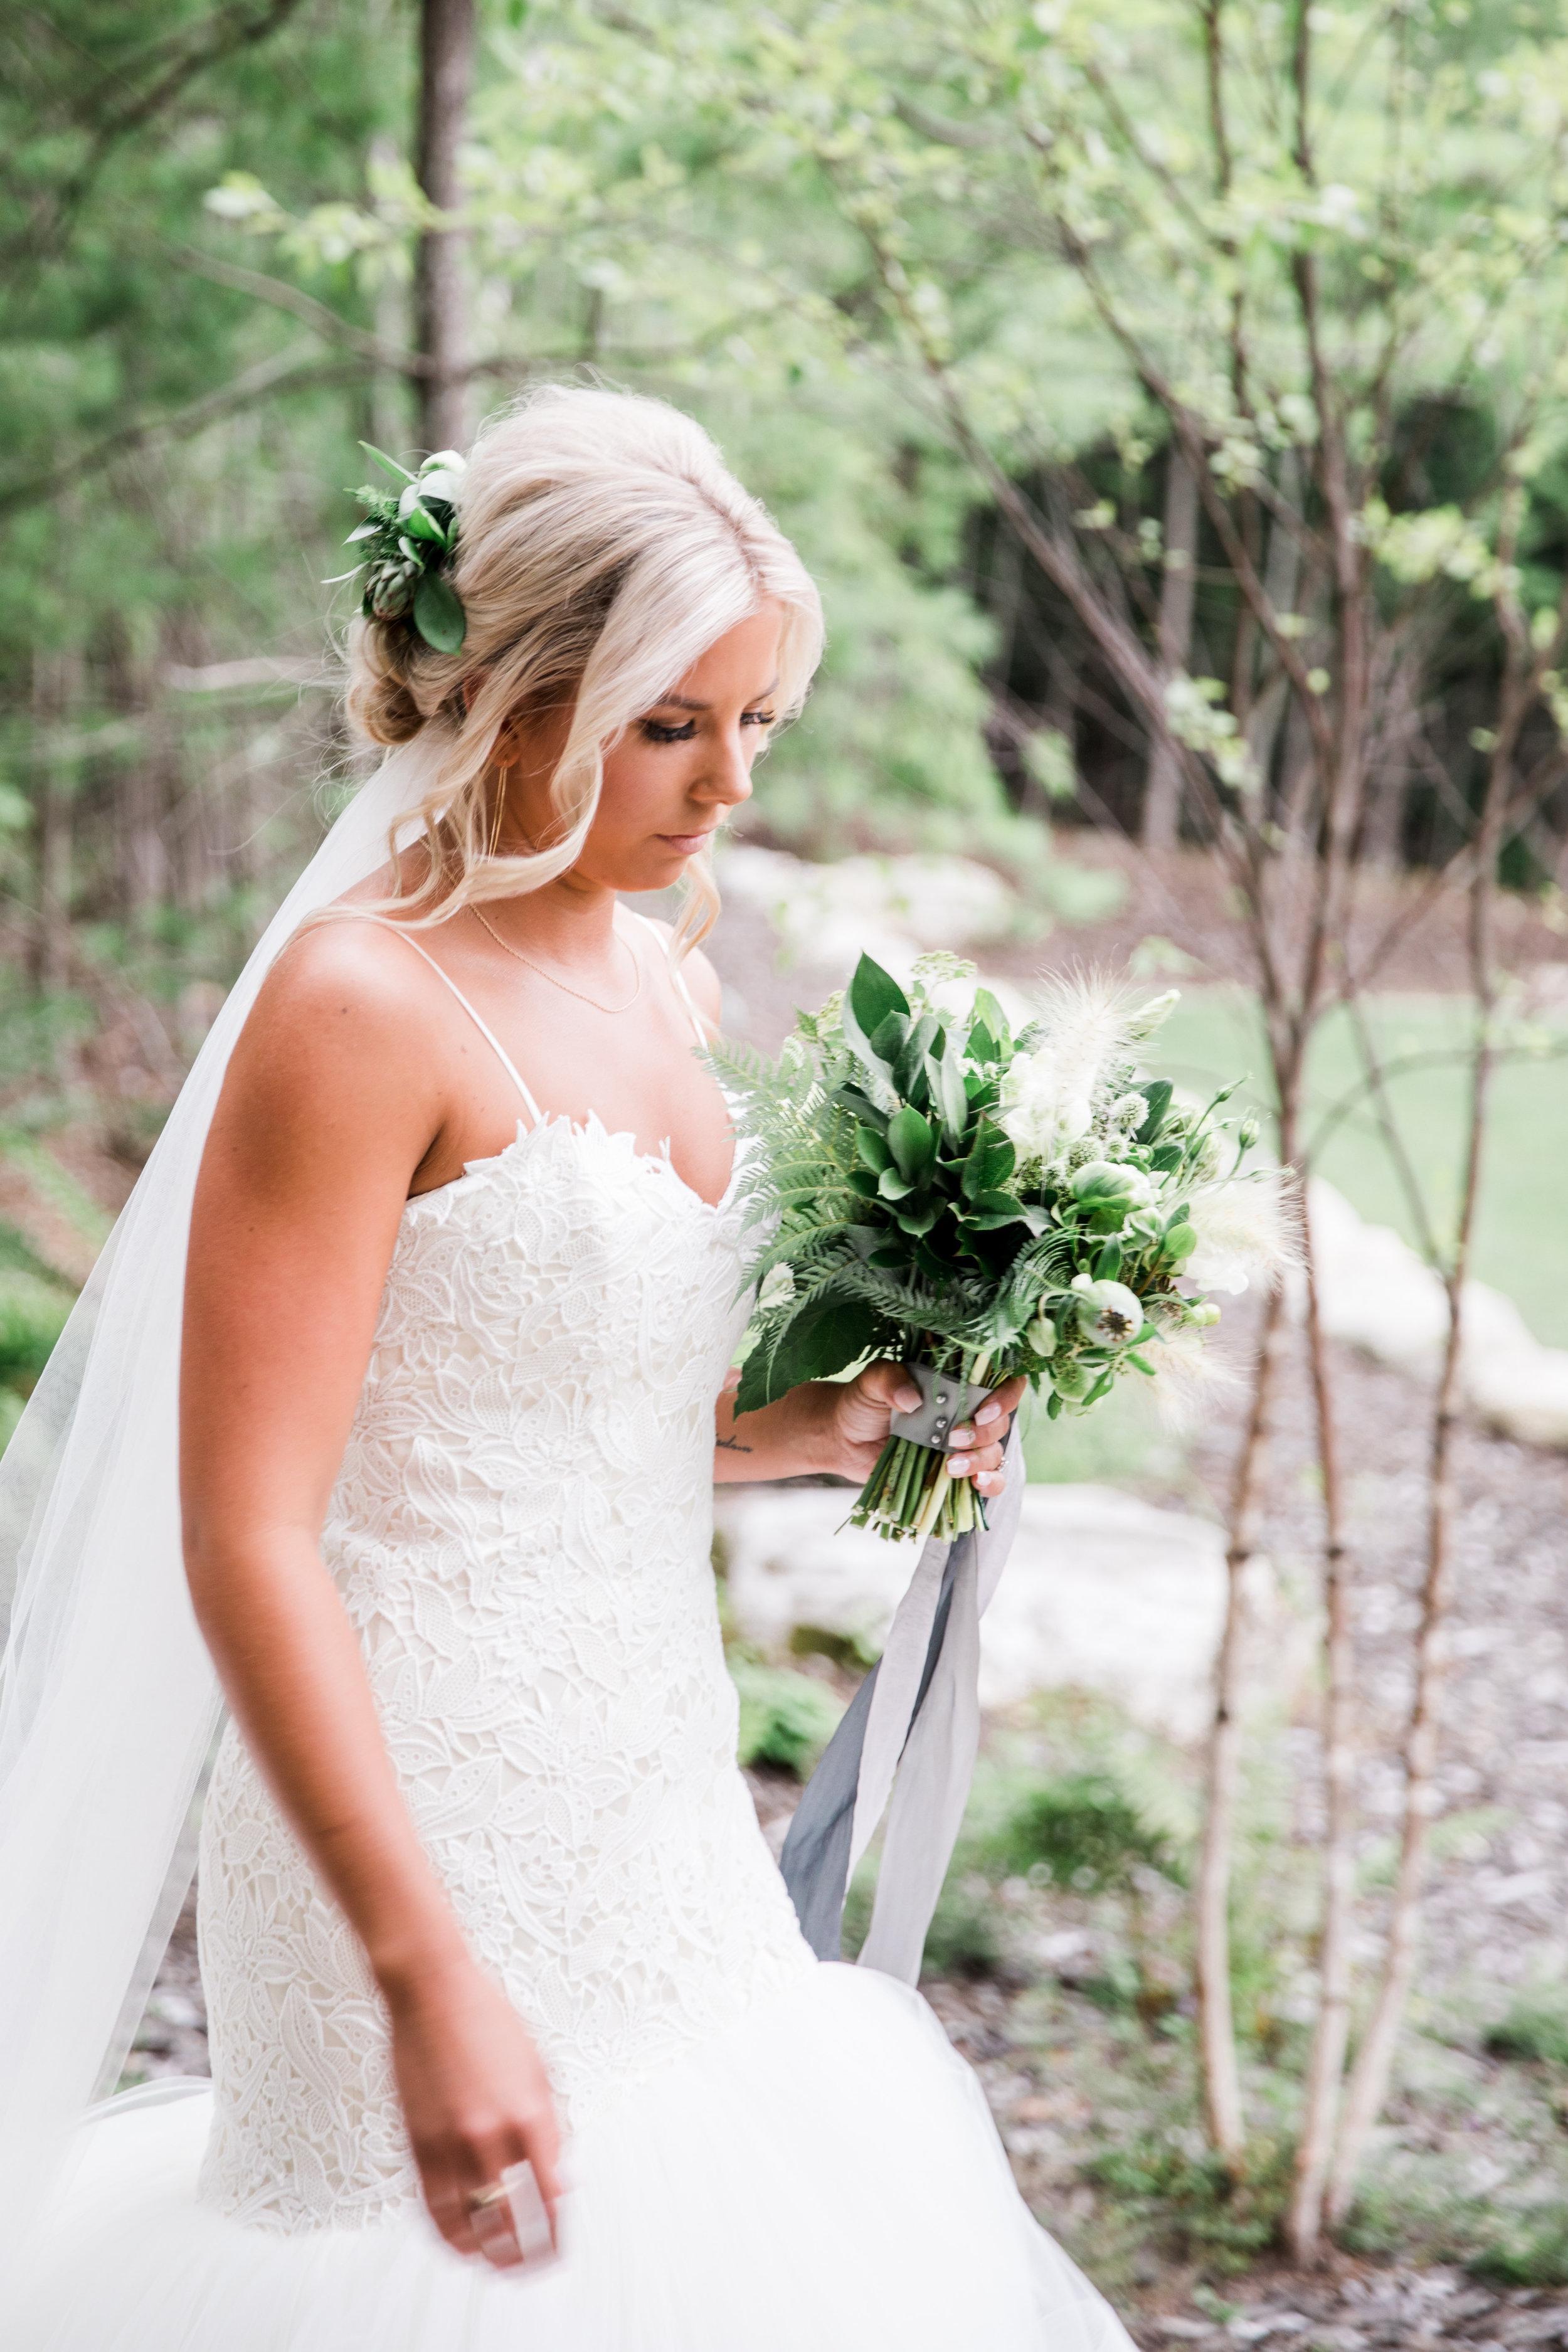 Watershed_Floral_Standish_Maine_Wedding_352.jpg